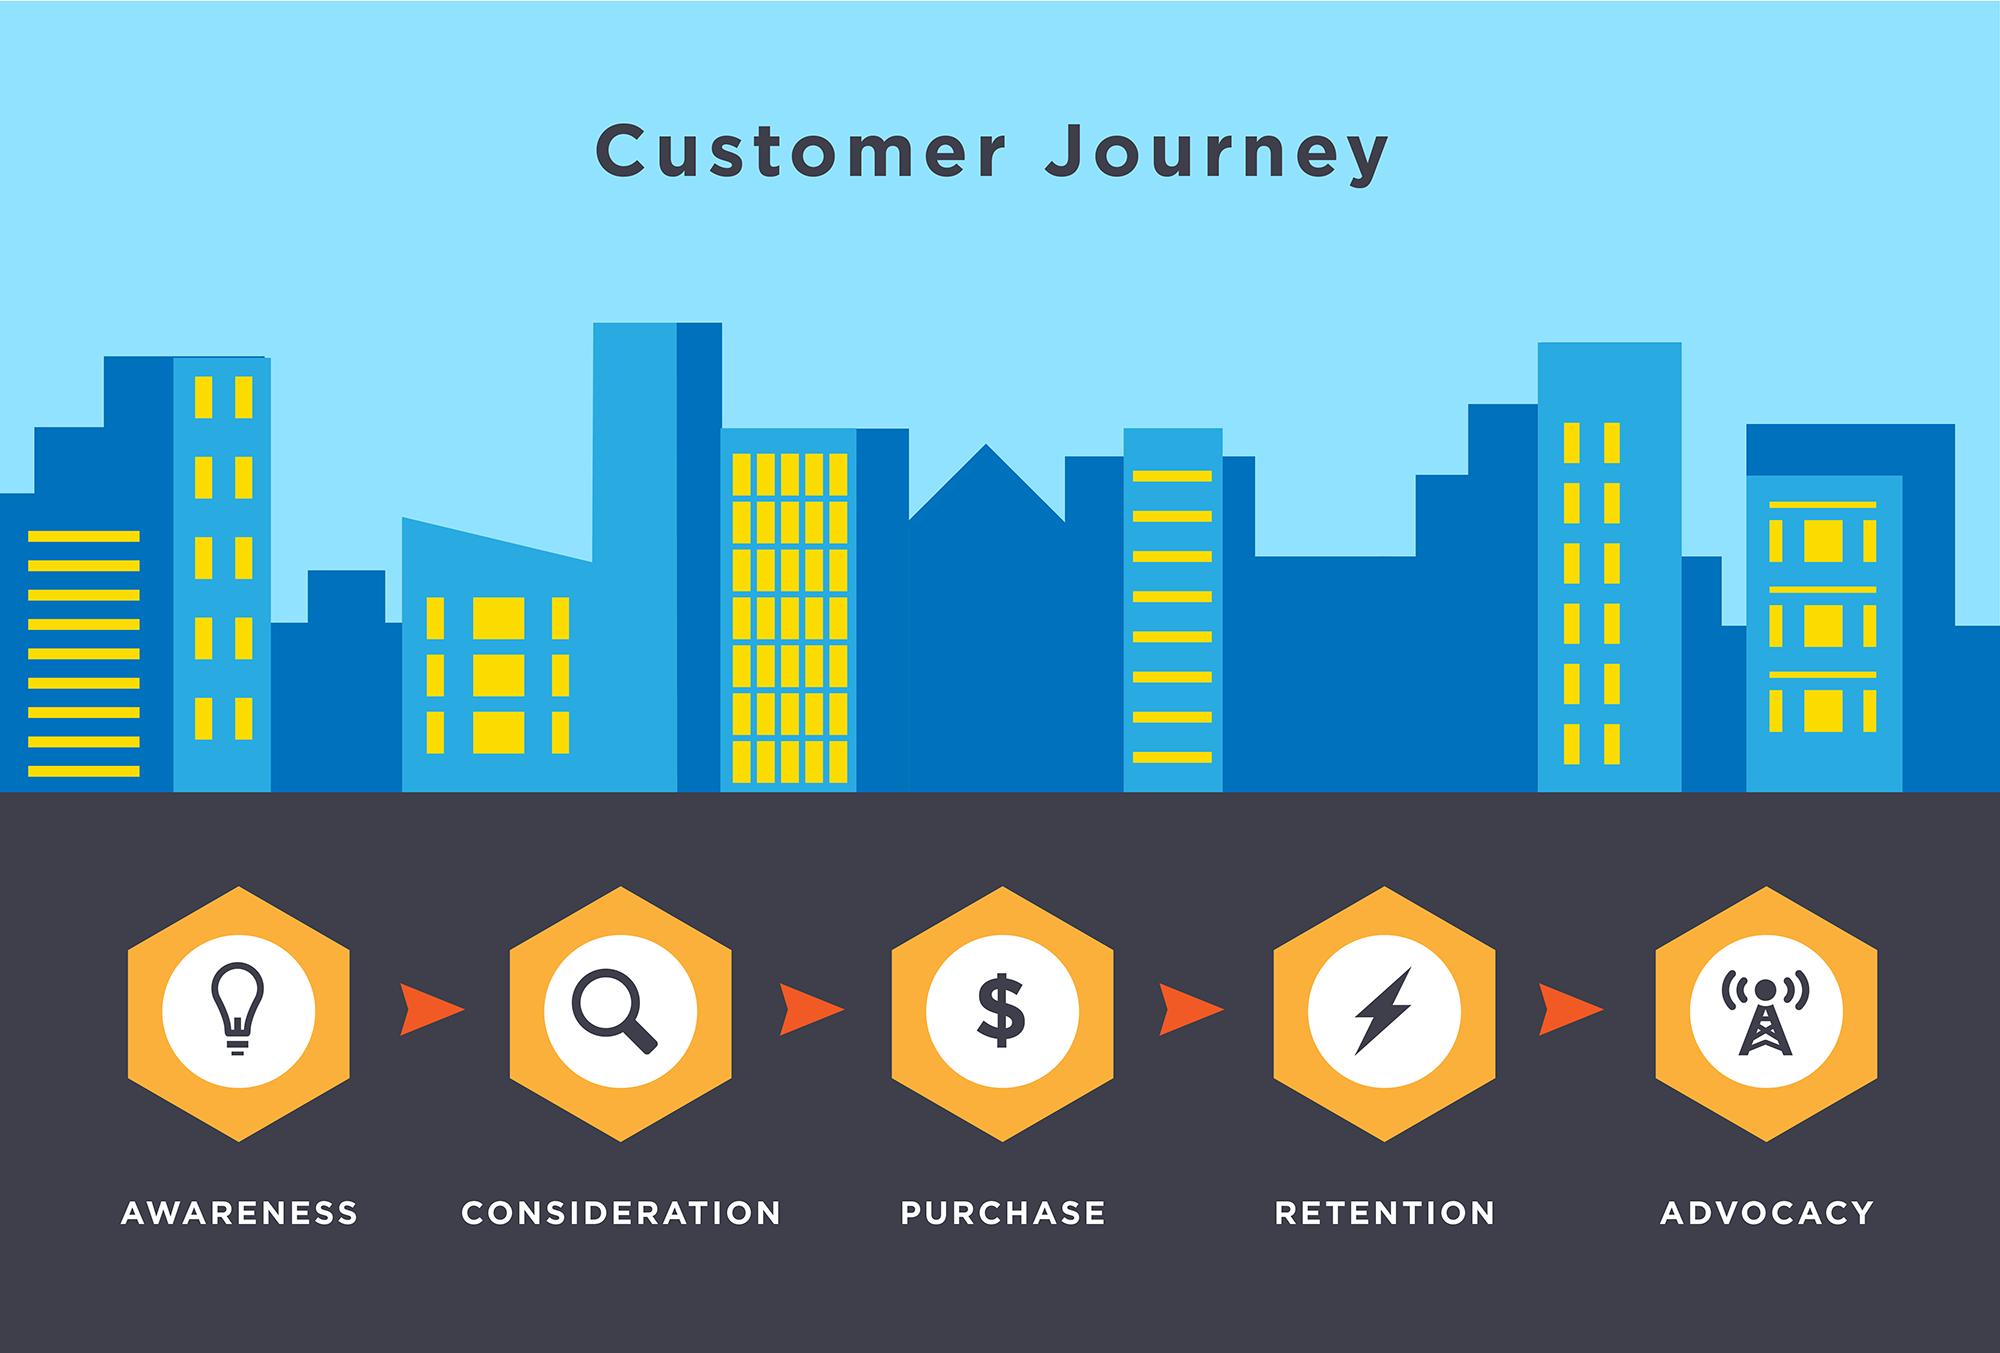 Customer Journey image